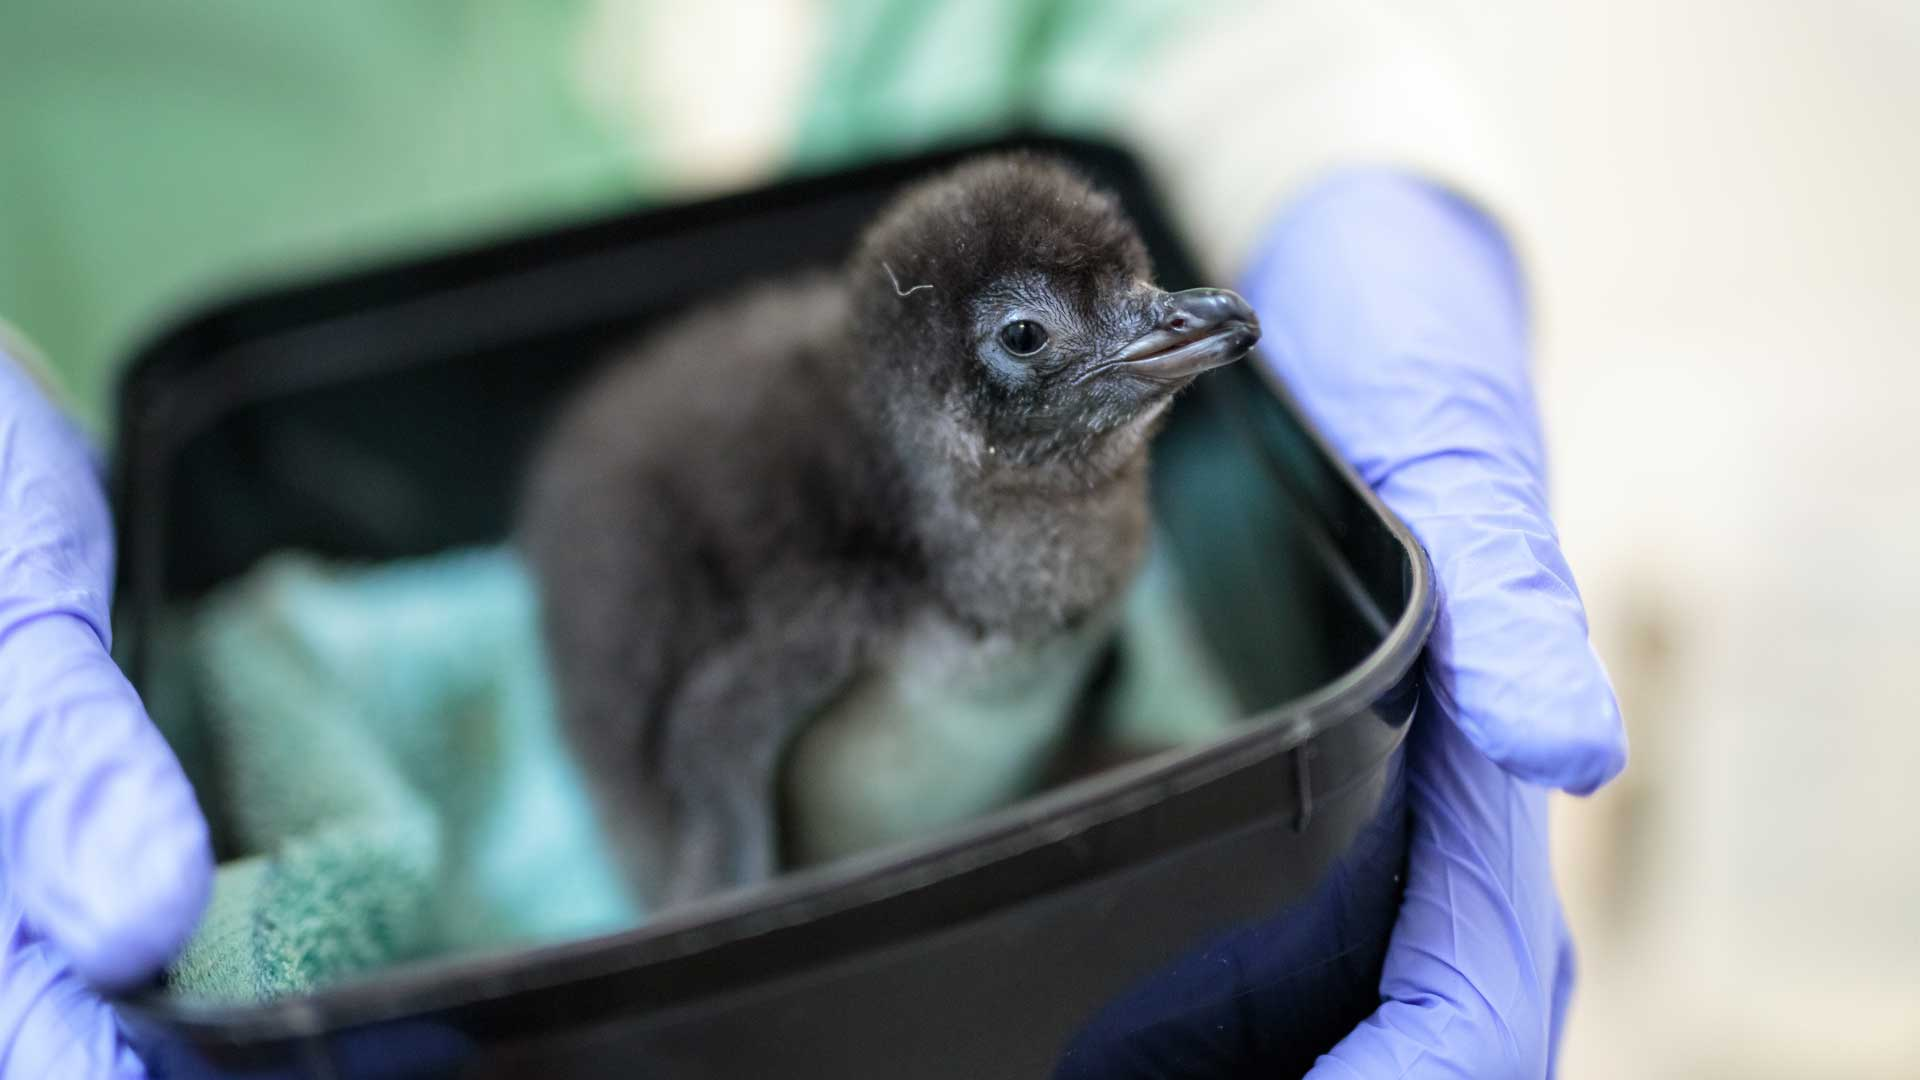 https://rfacdn.nz/zoo/assets/media/little-penguin-ohope-gallery-3.jpg